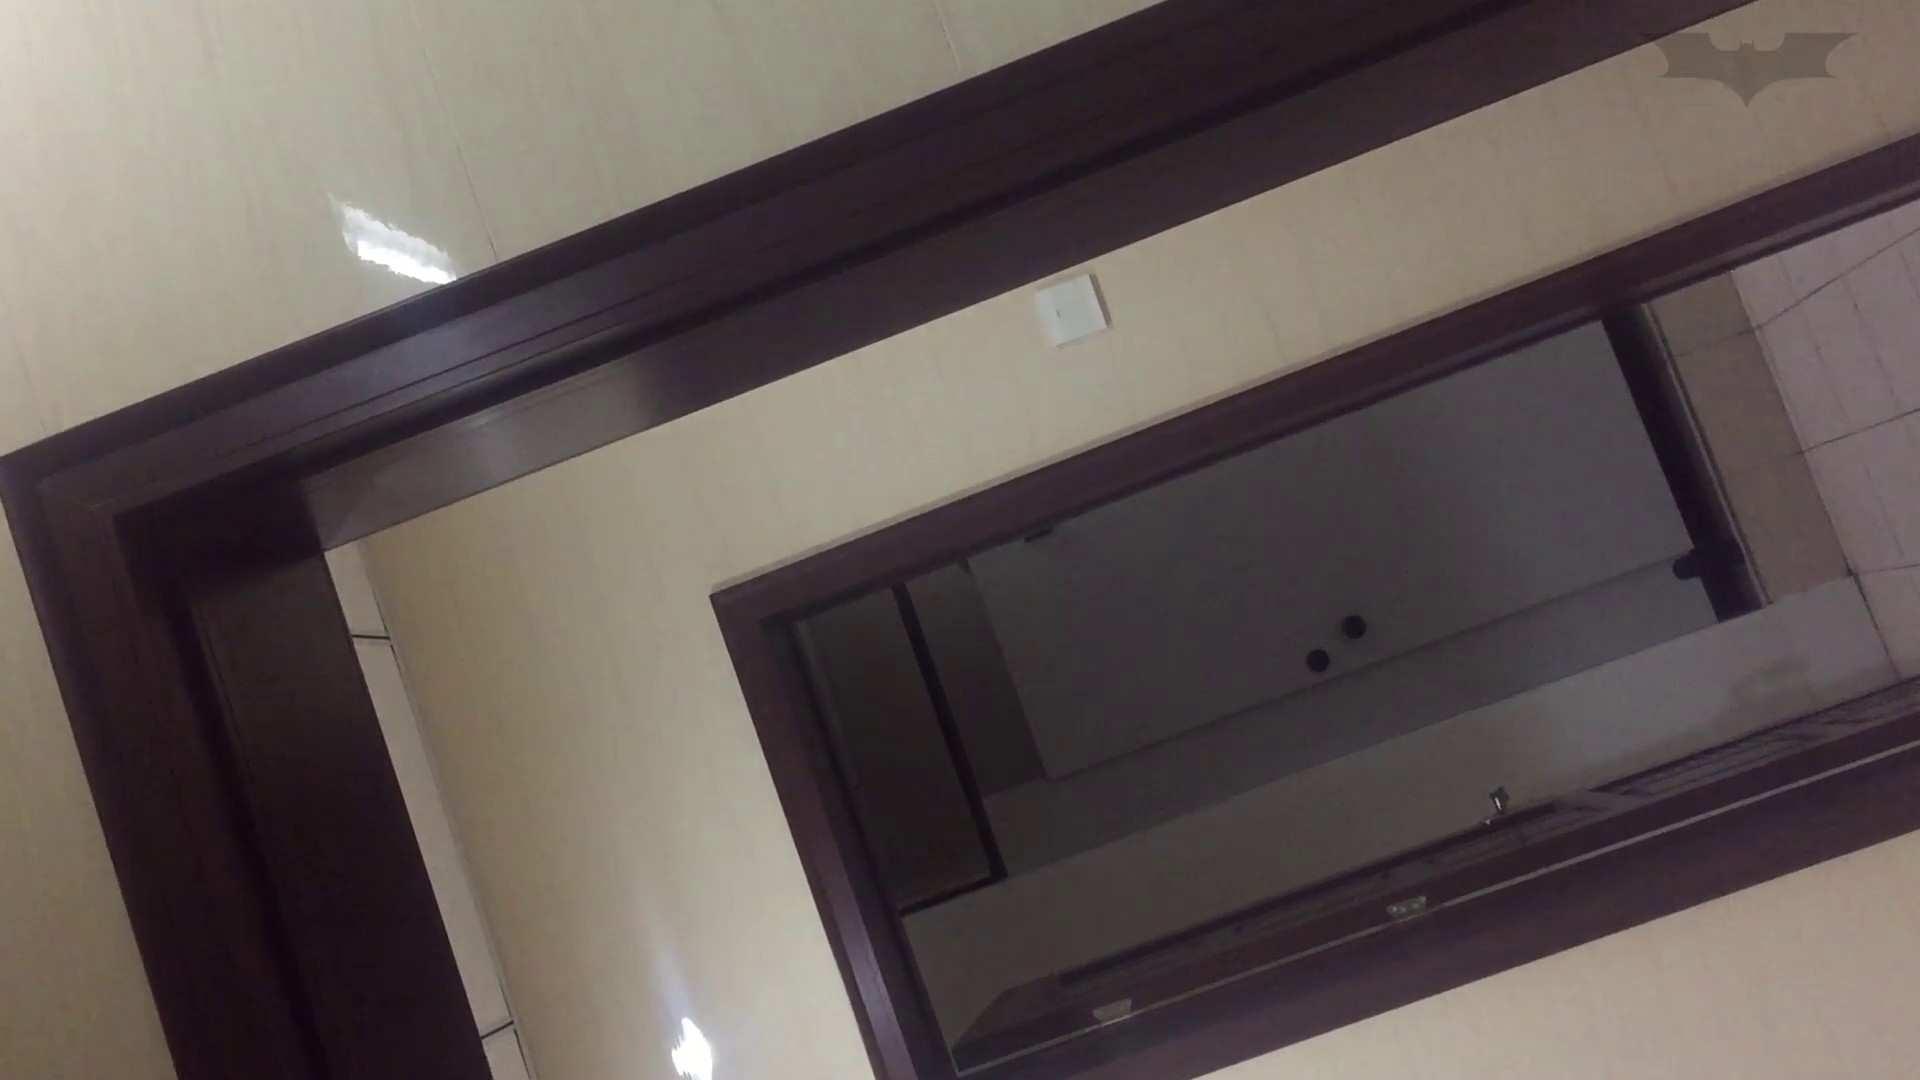 JD盗撮 美女の洗面所の秘密 Vol.72 ギャル達 ワレメ無修正動画無料 88枚 79